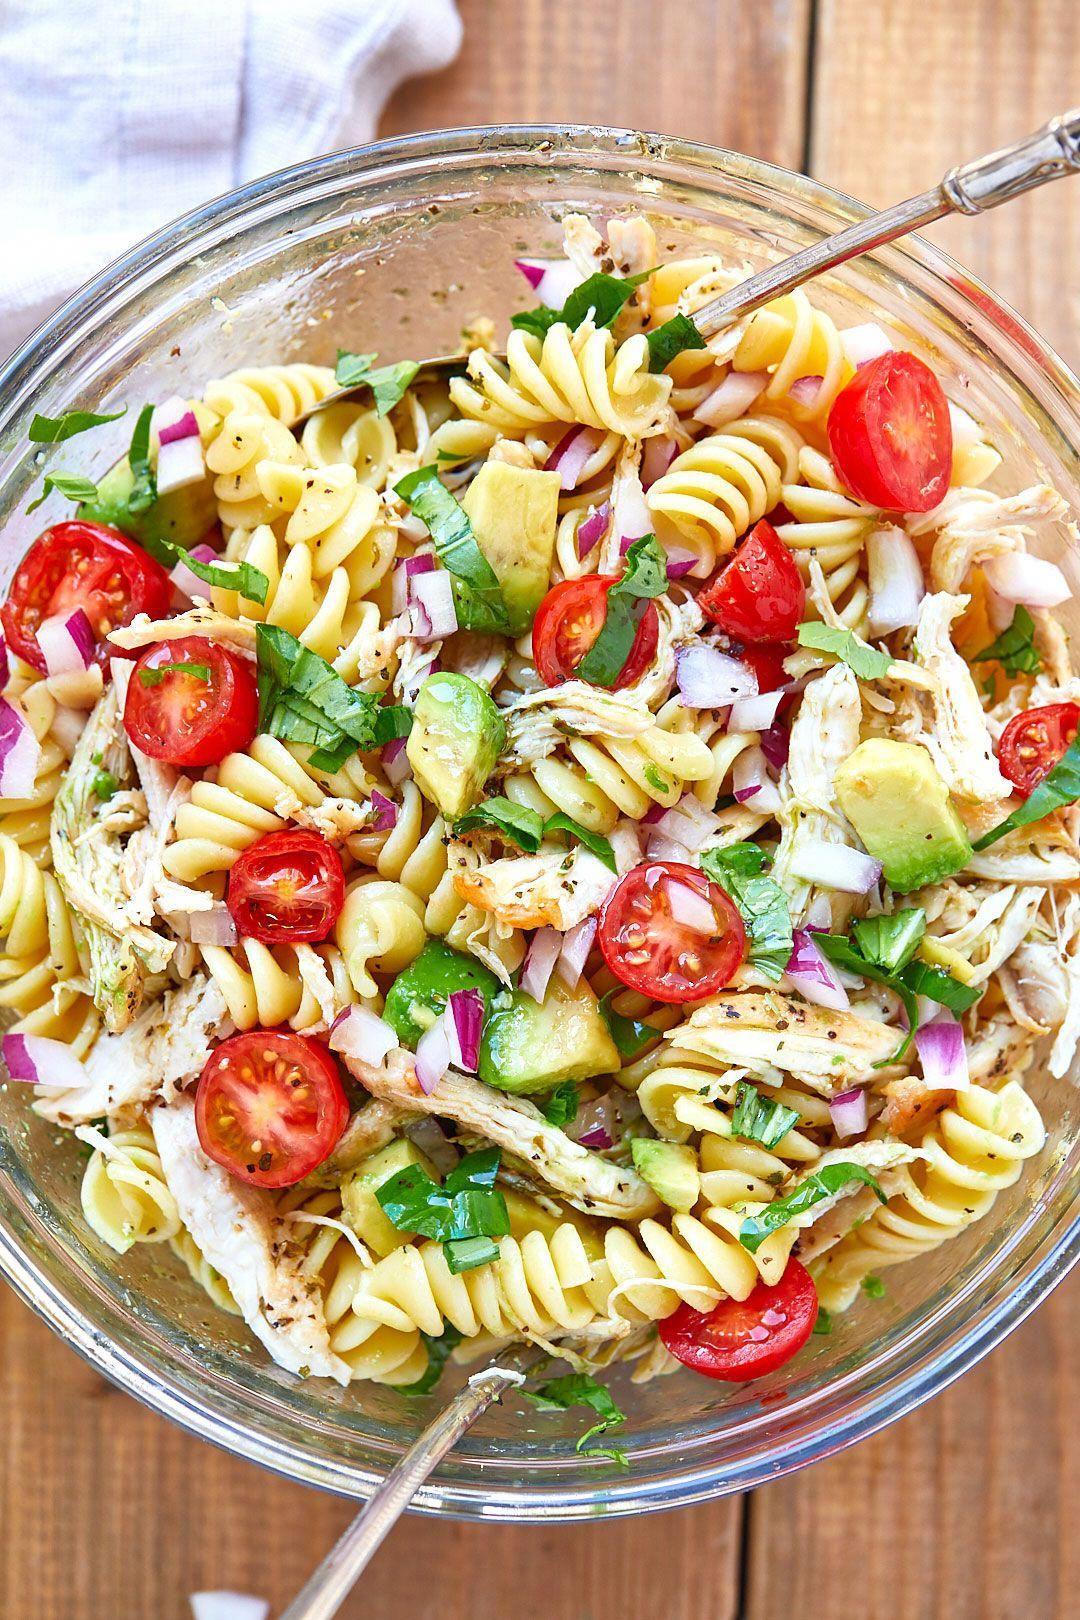 Pork Skewers With Vegetables Healthy Food Mom Recipe Chicken Pasta Salad Recipes Healthy Chicken Pasta Delicious Dinner Recipes